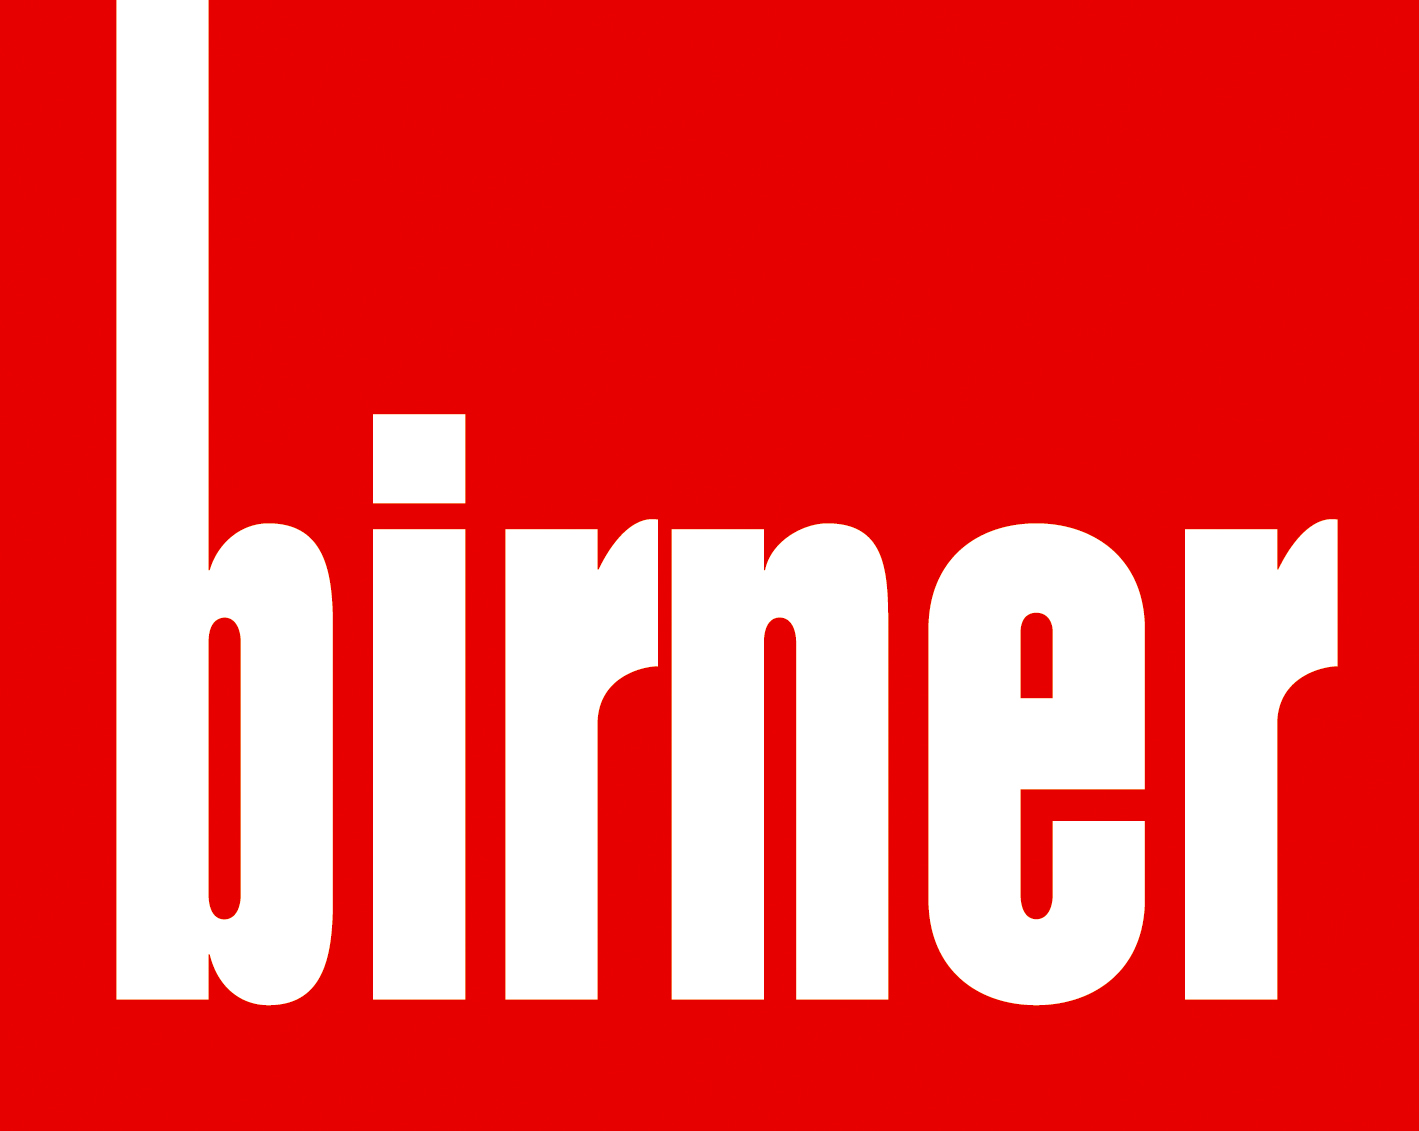 Birner Wien Simmering